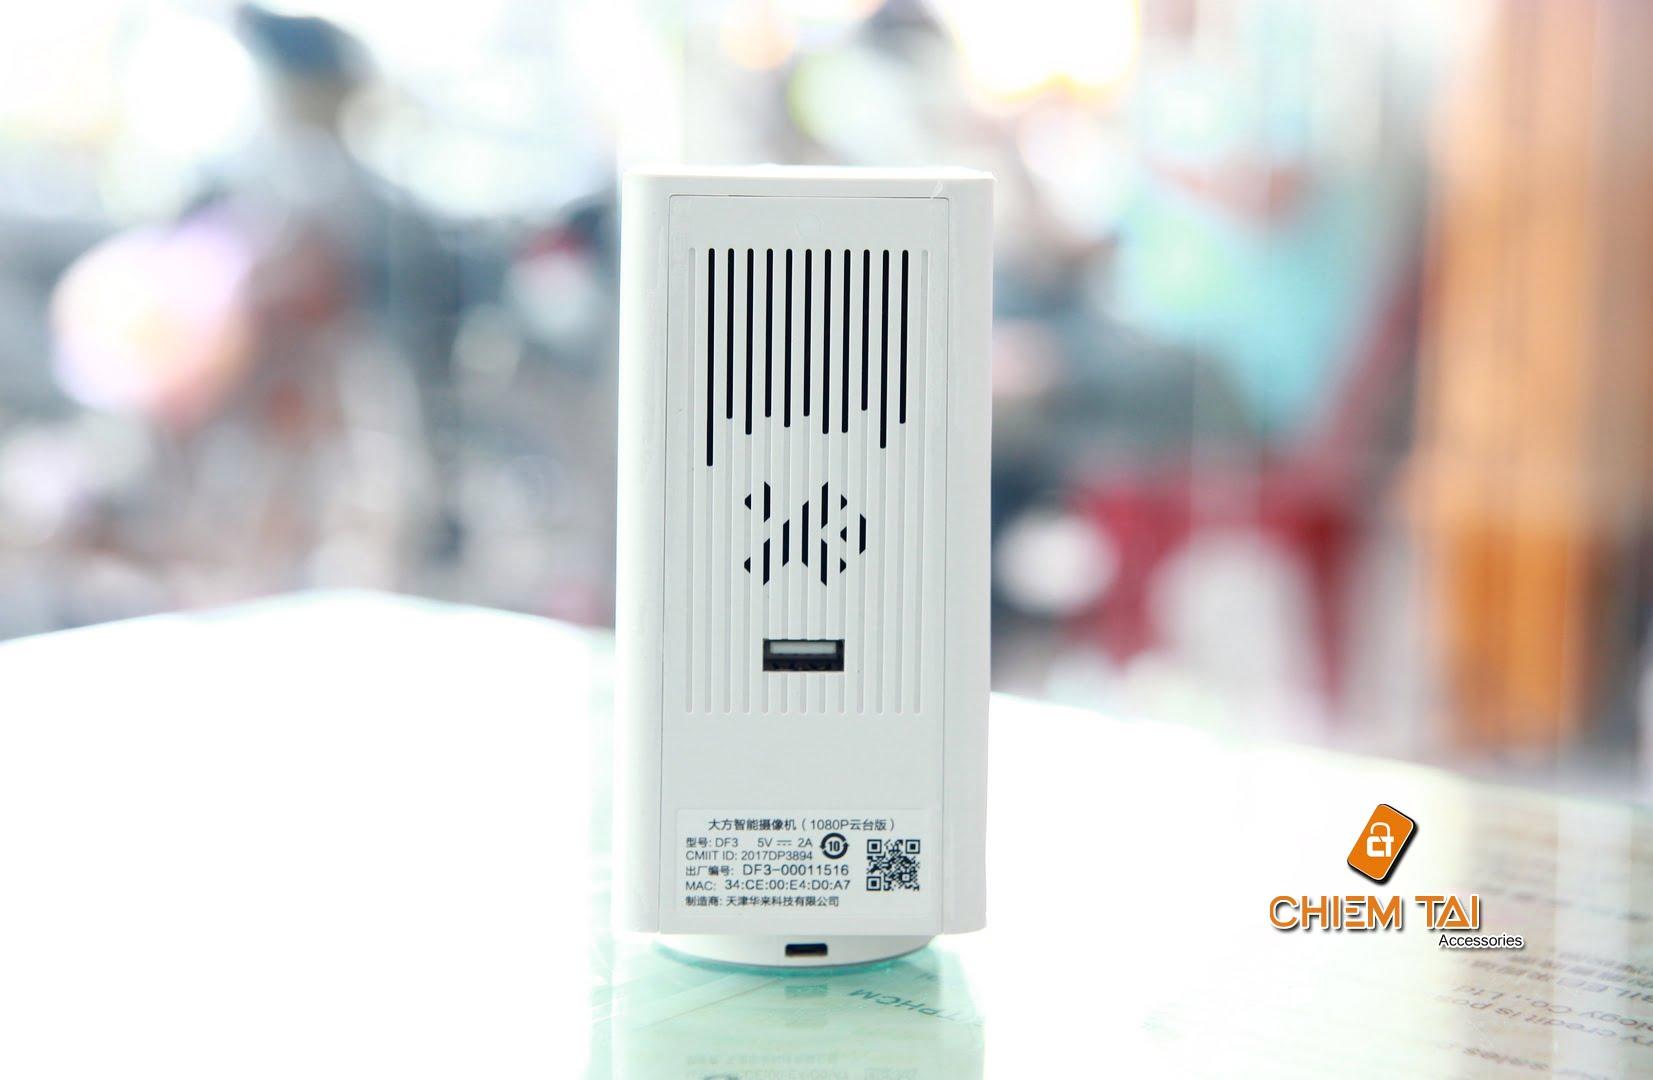 camera ip xiaomi xiaofang square ptz 360 full hd 1080p 6007d4452ee70